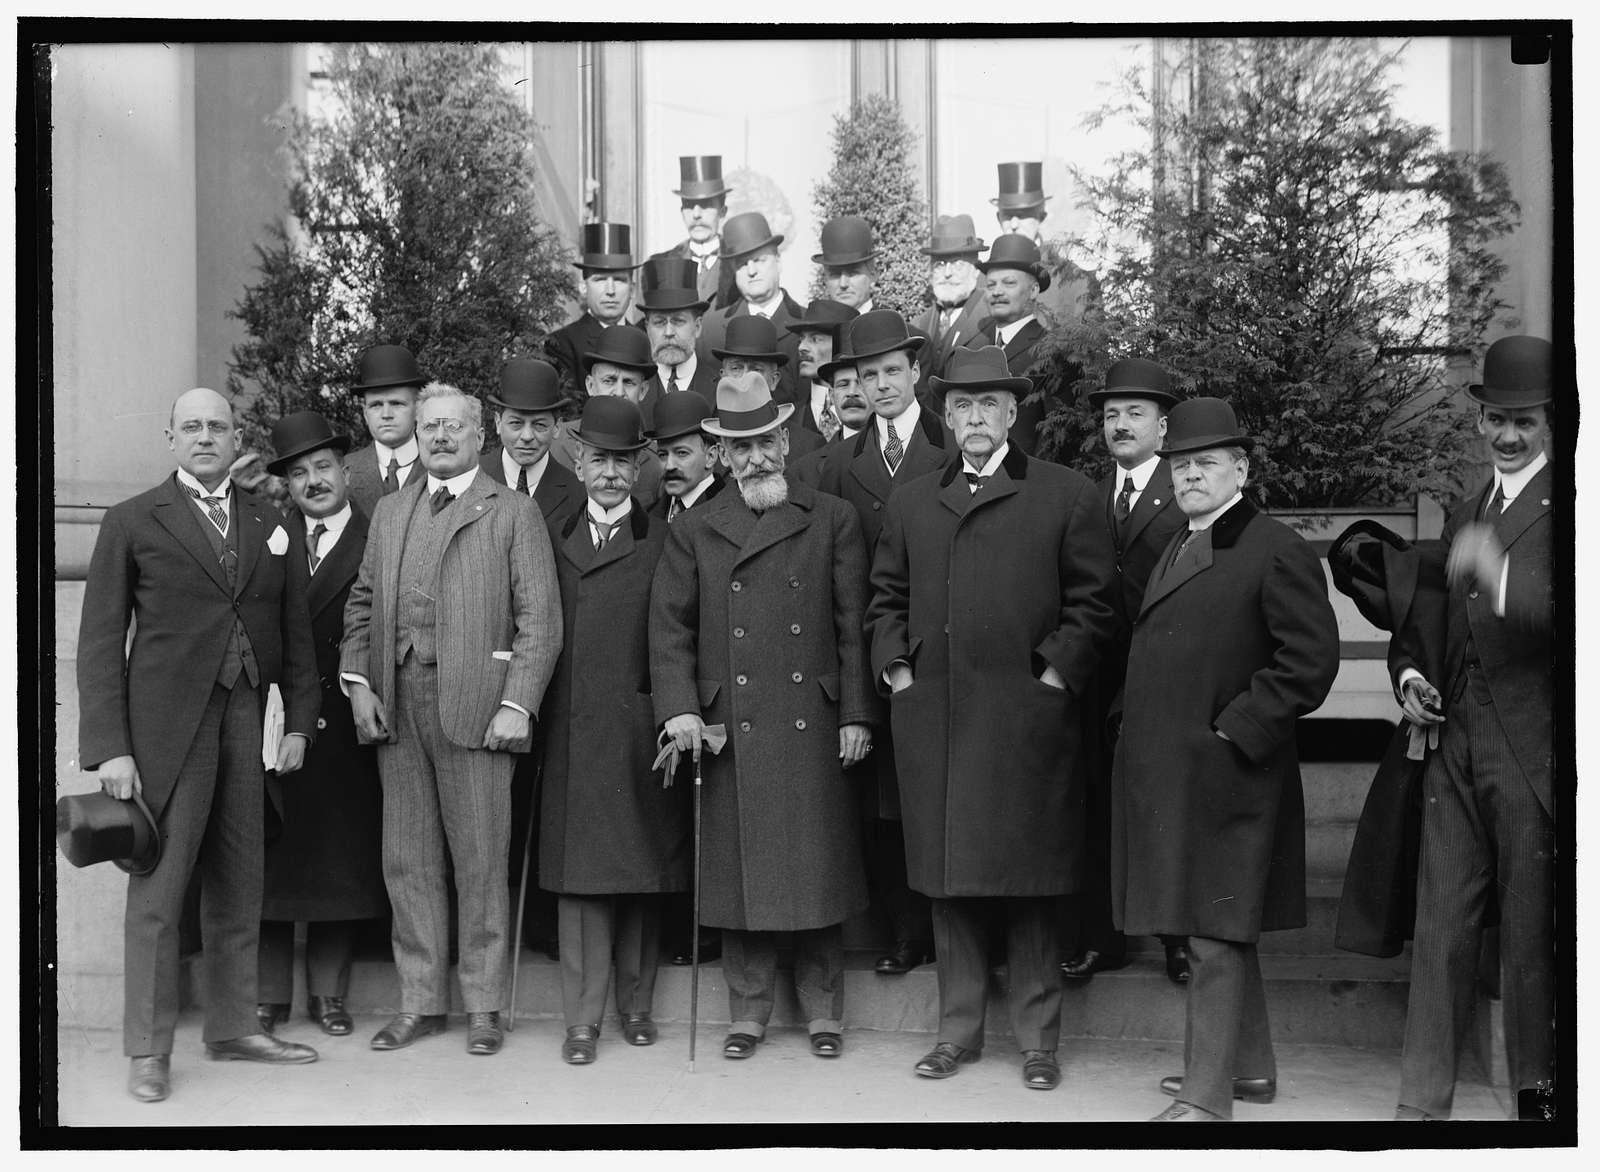 PAN AMERICAN SCIENTIFIC CONGRESS DECEMBER 1915-JANUARY 1916. EXECUTIVE COMMITTEE OF THE CONGRESS AND SOME OF ORGANIZING COMMITTEE. 1ST ROW: JOHN BARRETT; ENSEBIO AYALA, PRES. DELN. PARAGUAY; ERNESTO QUESADA, PRES. ARGENTINE DELN.; AMBASSADOR DOMICIO DA GAMA, PRES. BRAZILIAN DELN.; AMB. SUAREZMUJICA, PRES. CHILIAN DELN.; JUDGE GEORGE GRAY, PRES. U.S. DELN.; MIN. CARLOS M. DEPENA, PRES. URUGUAYAN DELN.; MANUEL GAMIO OF MEXICAN DELN. 2ND ROW: JULIO PHILIPPI, V.P. CHILIAN DELN.; MIN. JOAQUIN MENDEZ, PRES. GUATEMALEN DELN